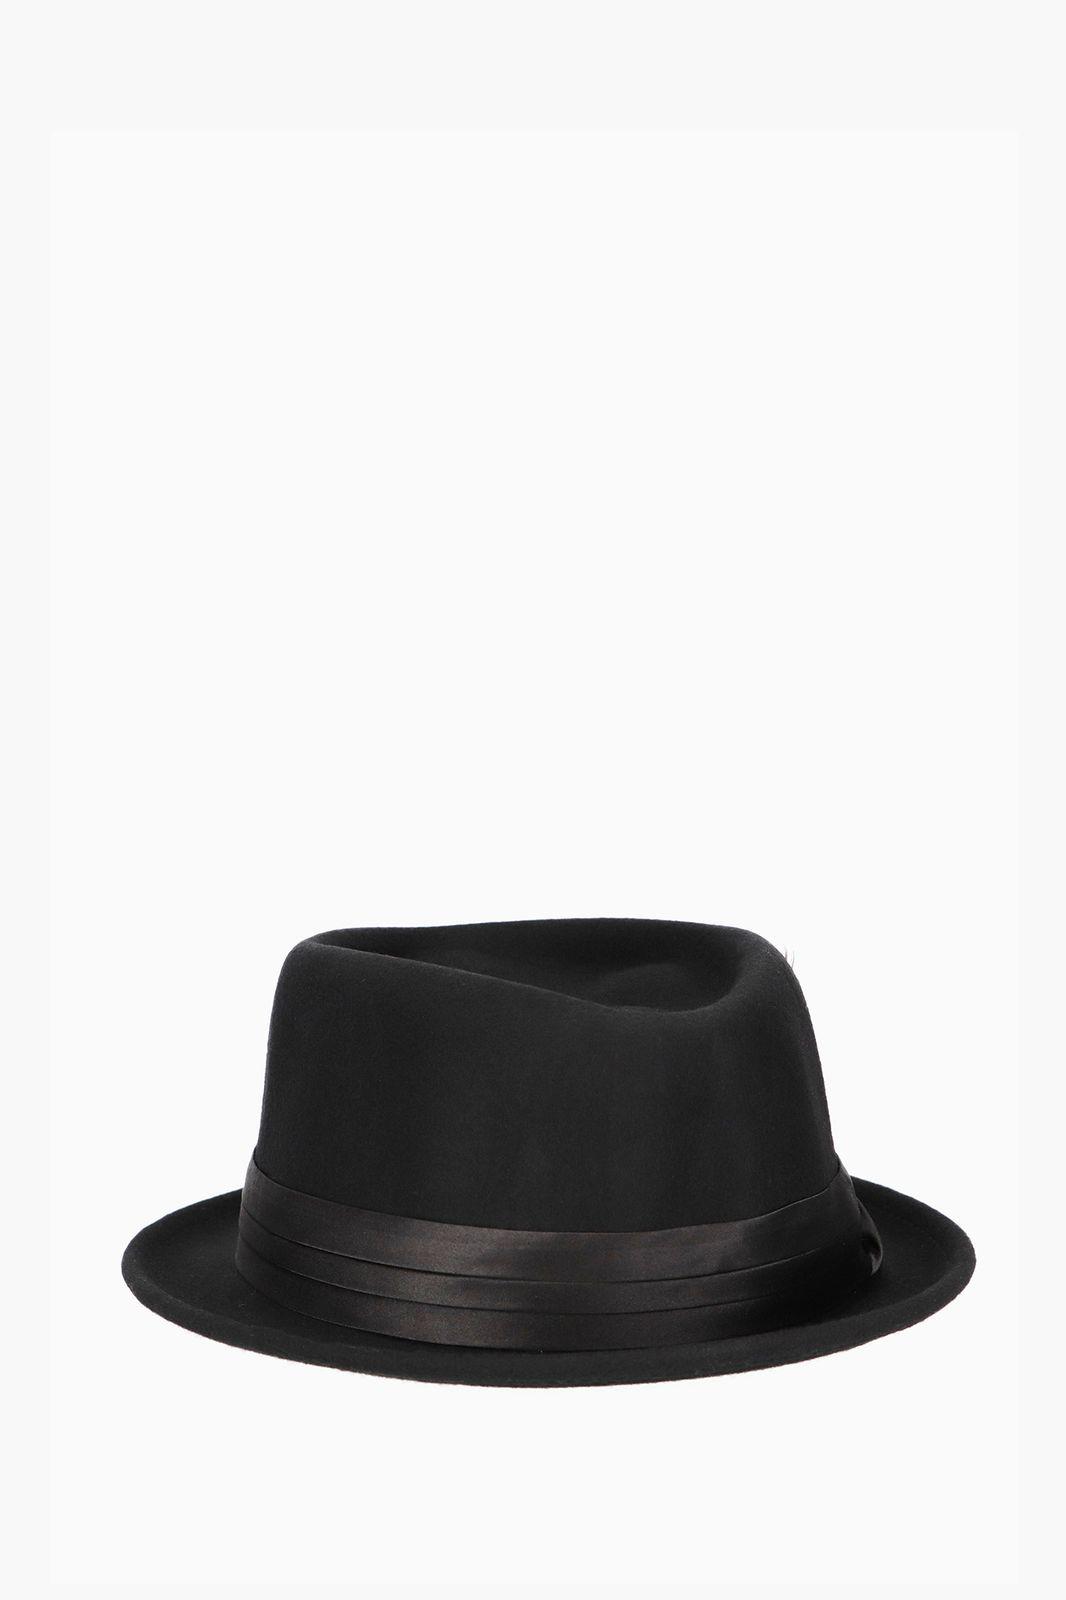 Brixton hoed met veren detail - Heren | Sissy-Boy